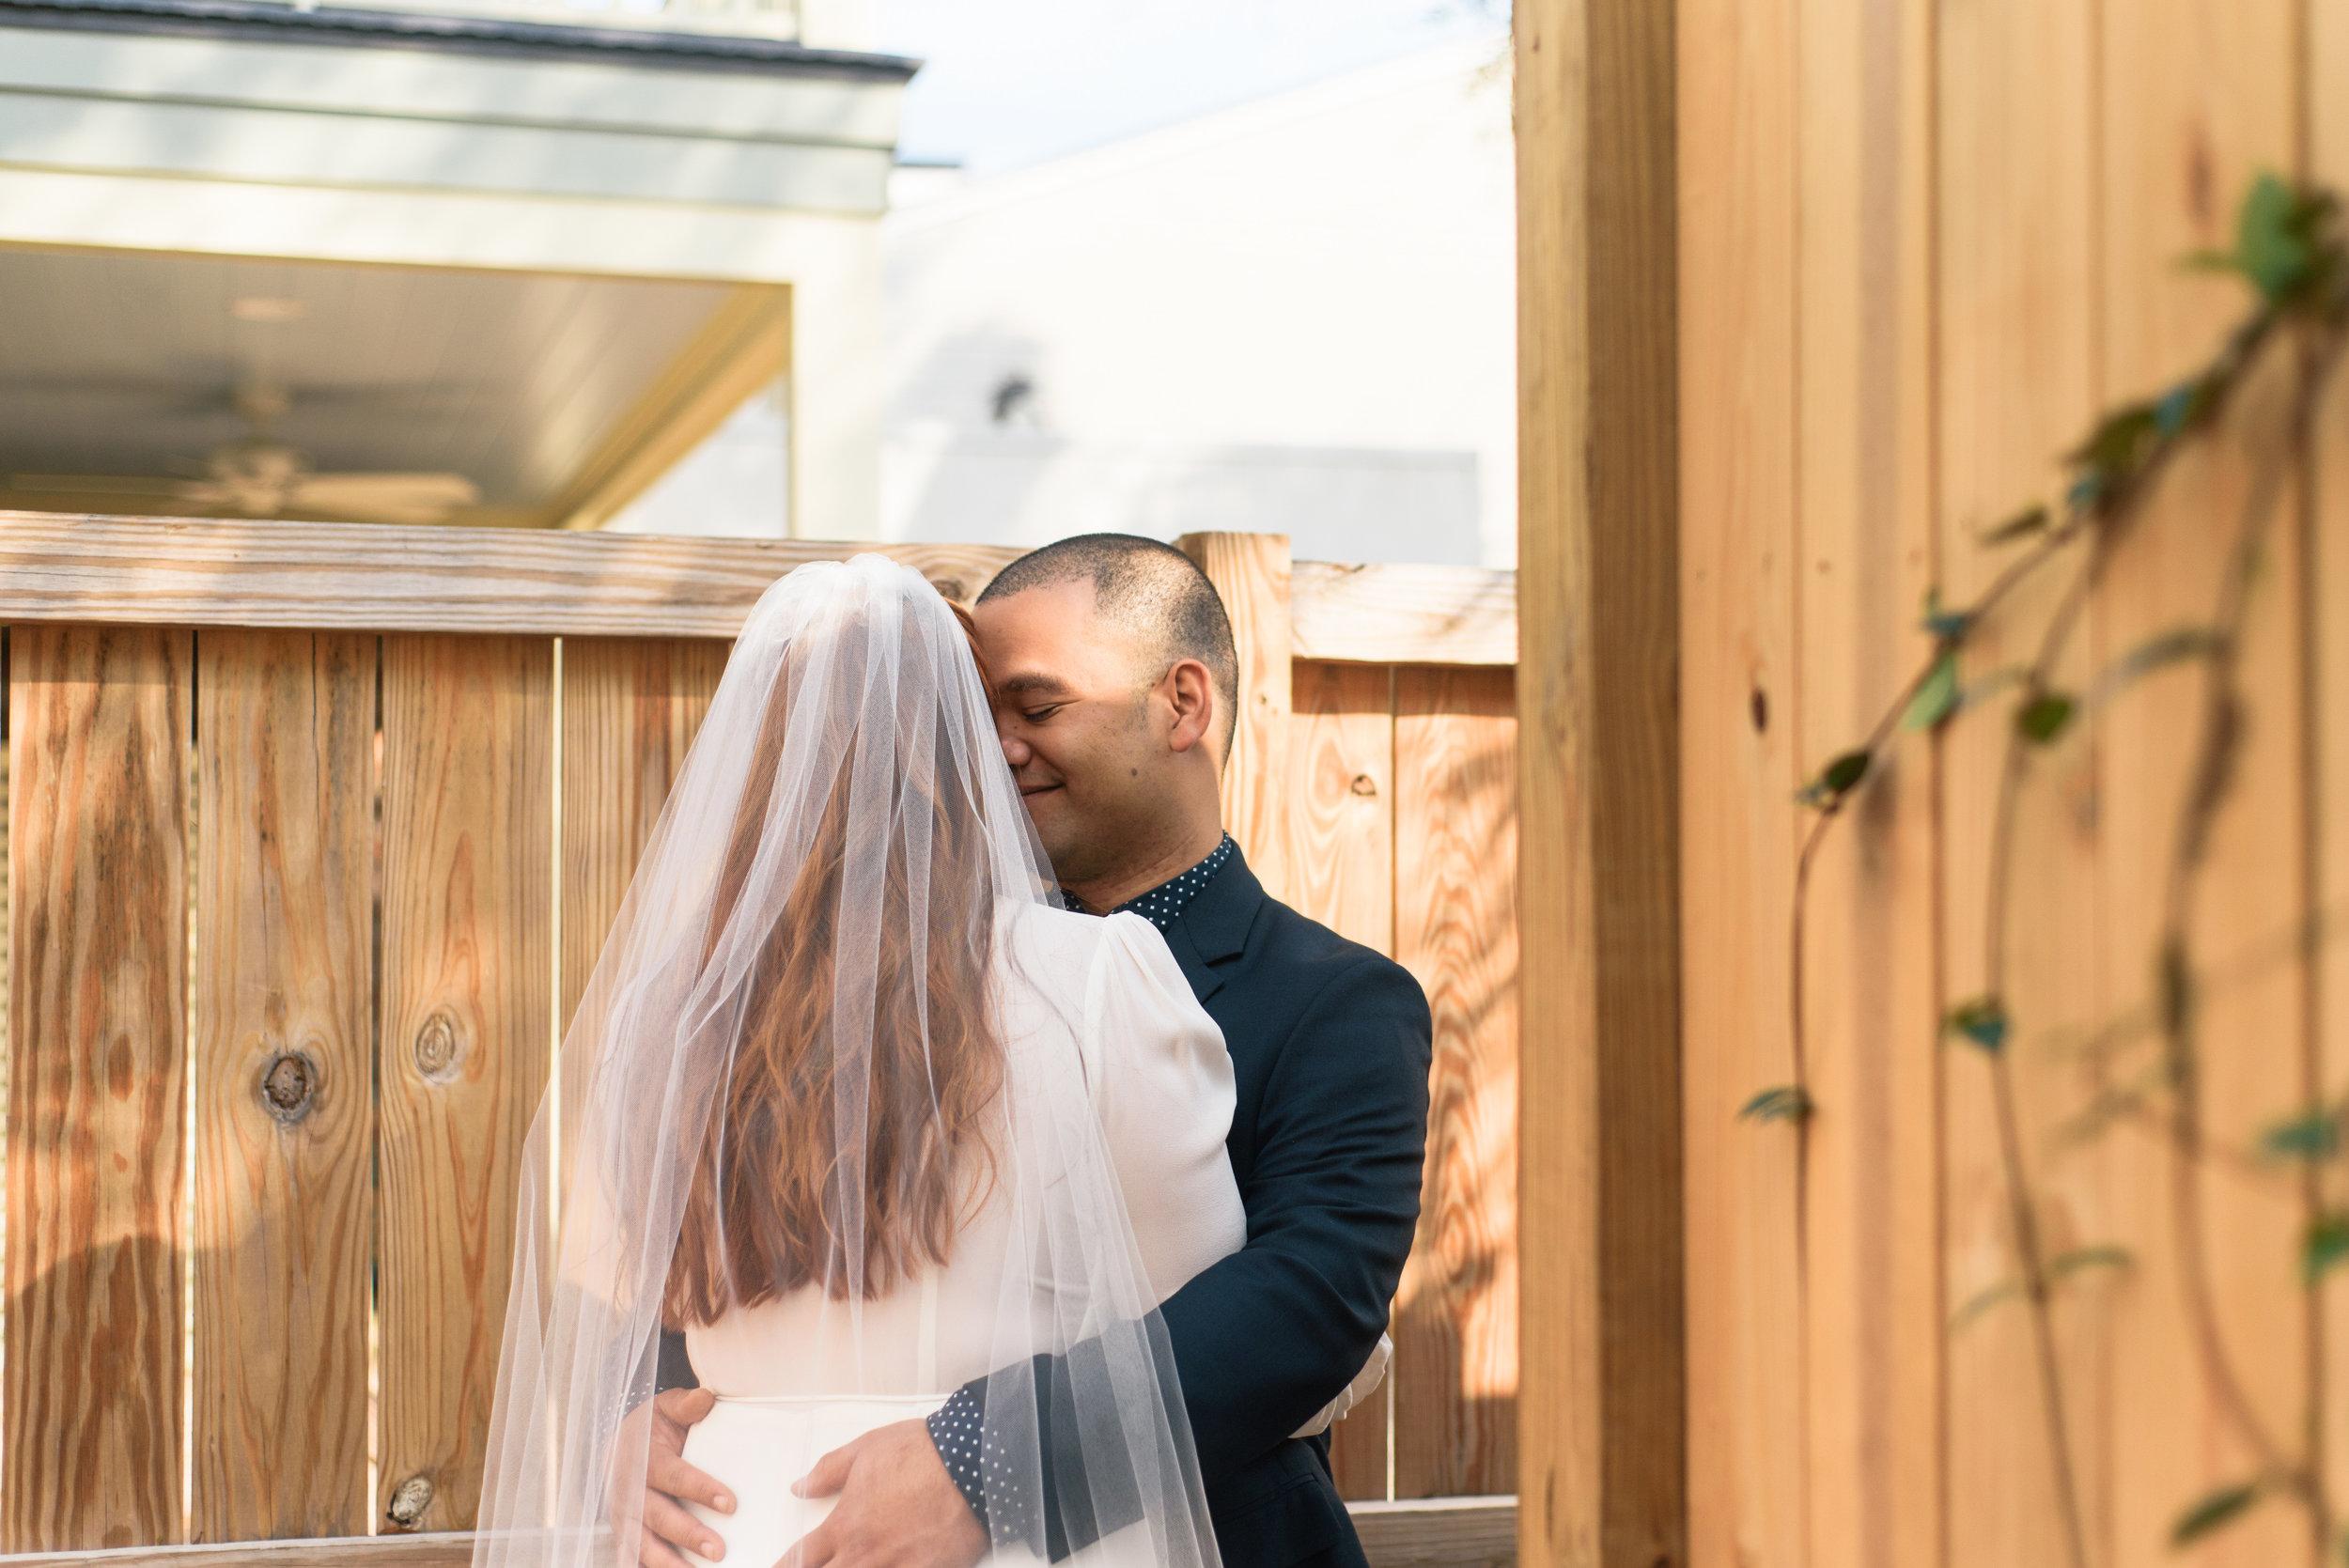 savannah-elopement-photography-savannah-georgia-elopement-photographer-savannah-wedding-photographer-meg-hill-photo-jade-hill- (16 of 58).jpg